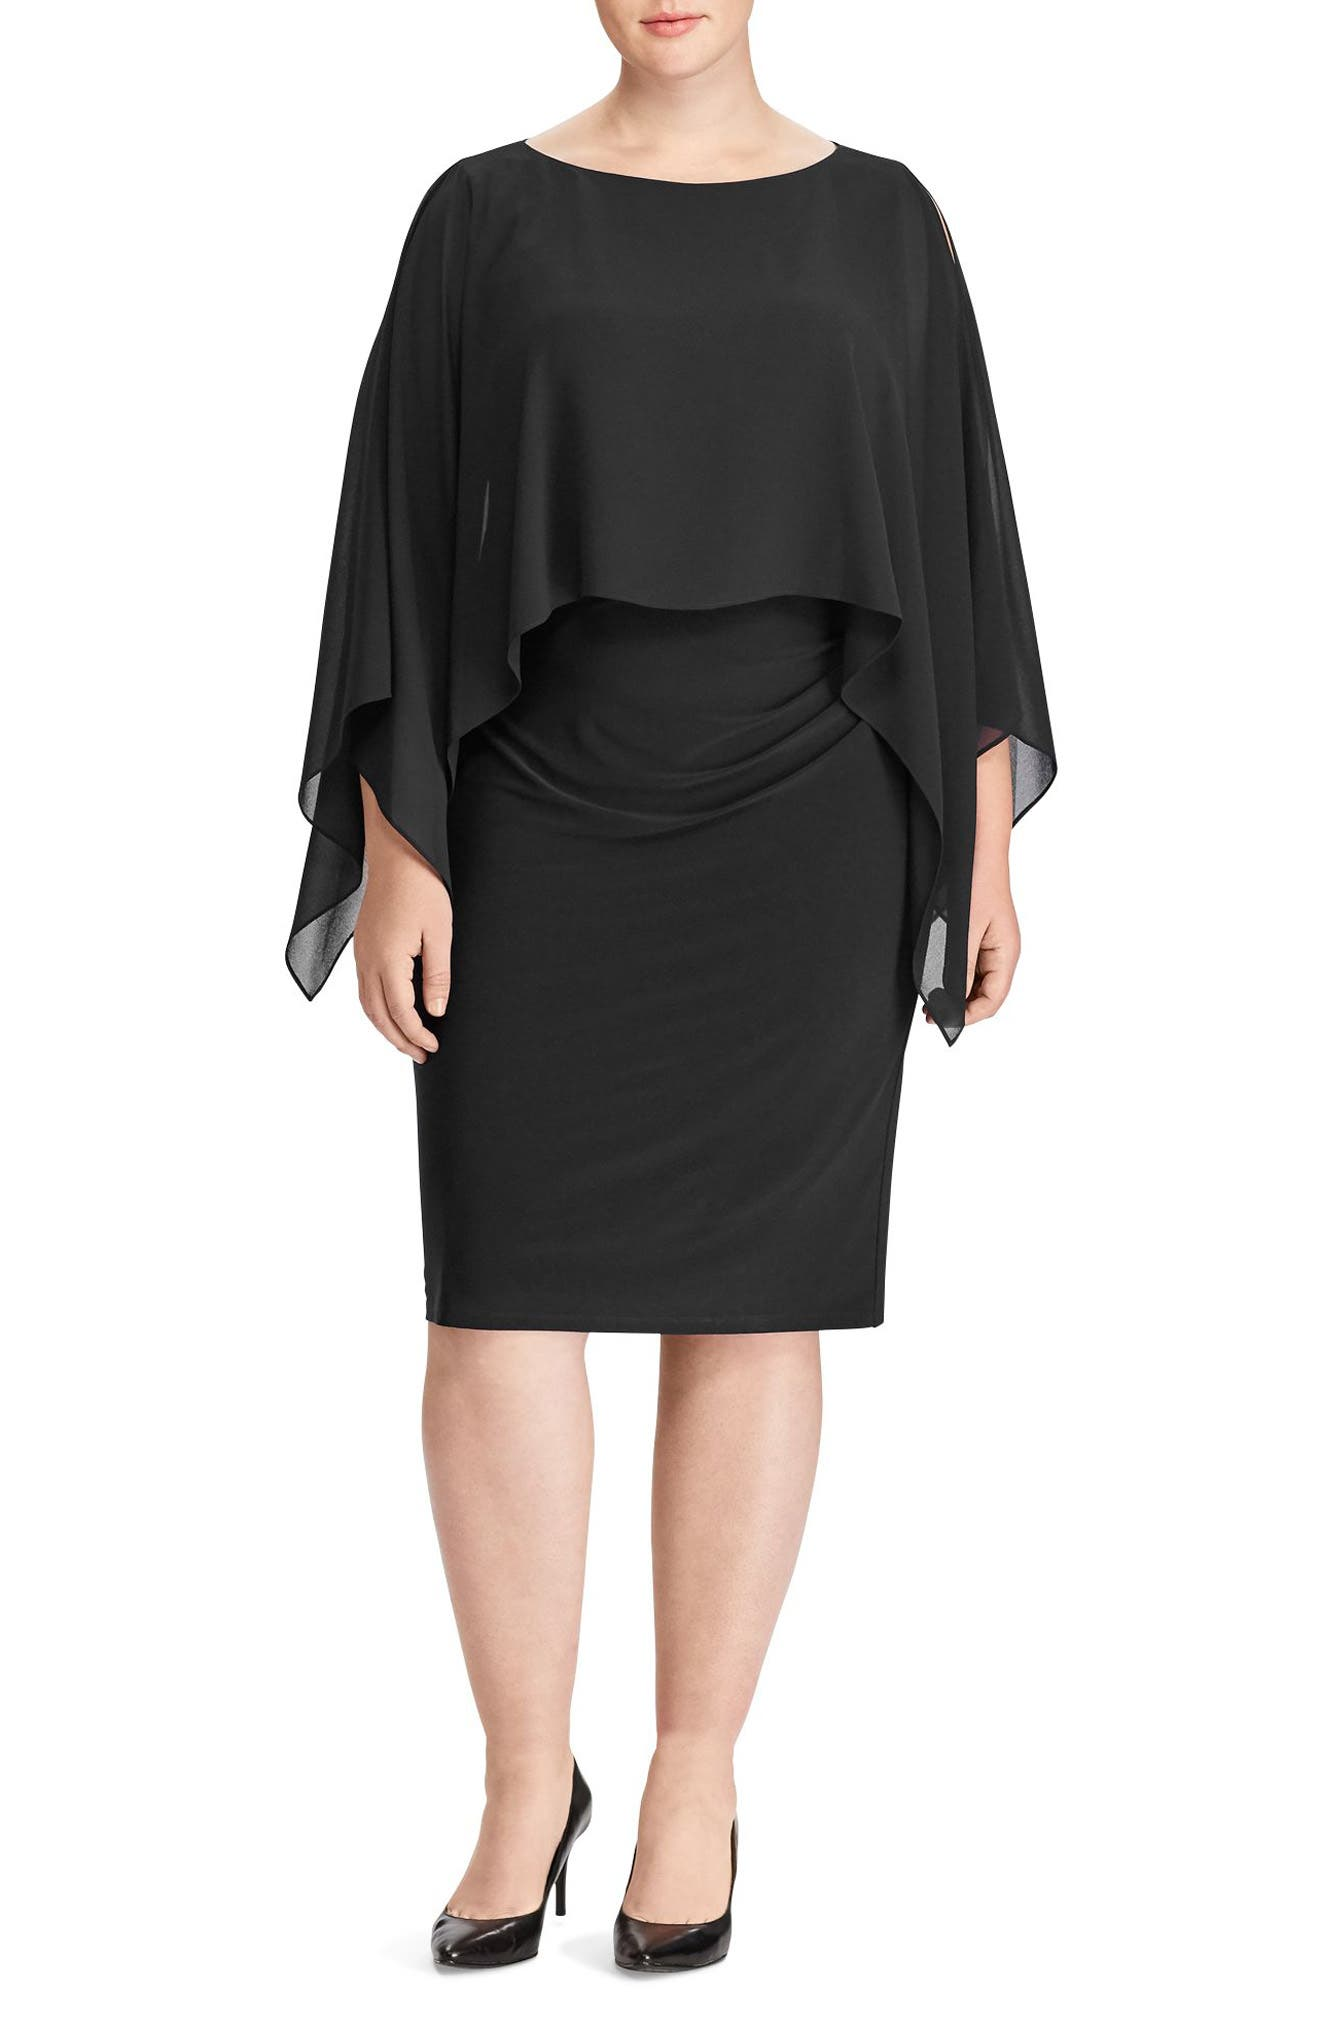 Mercinitta Dress,                         Main,                         color, 001